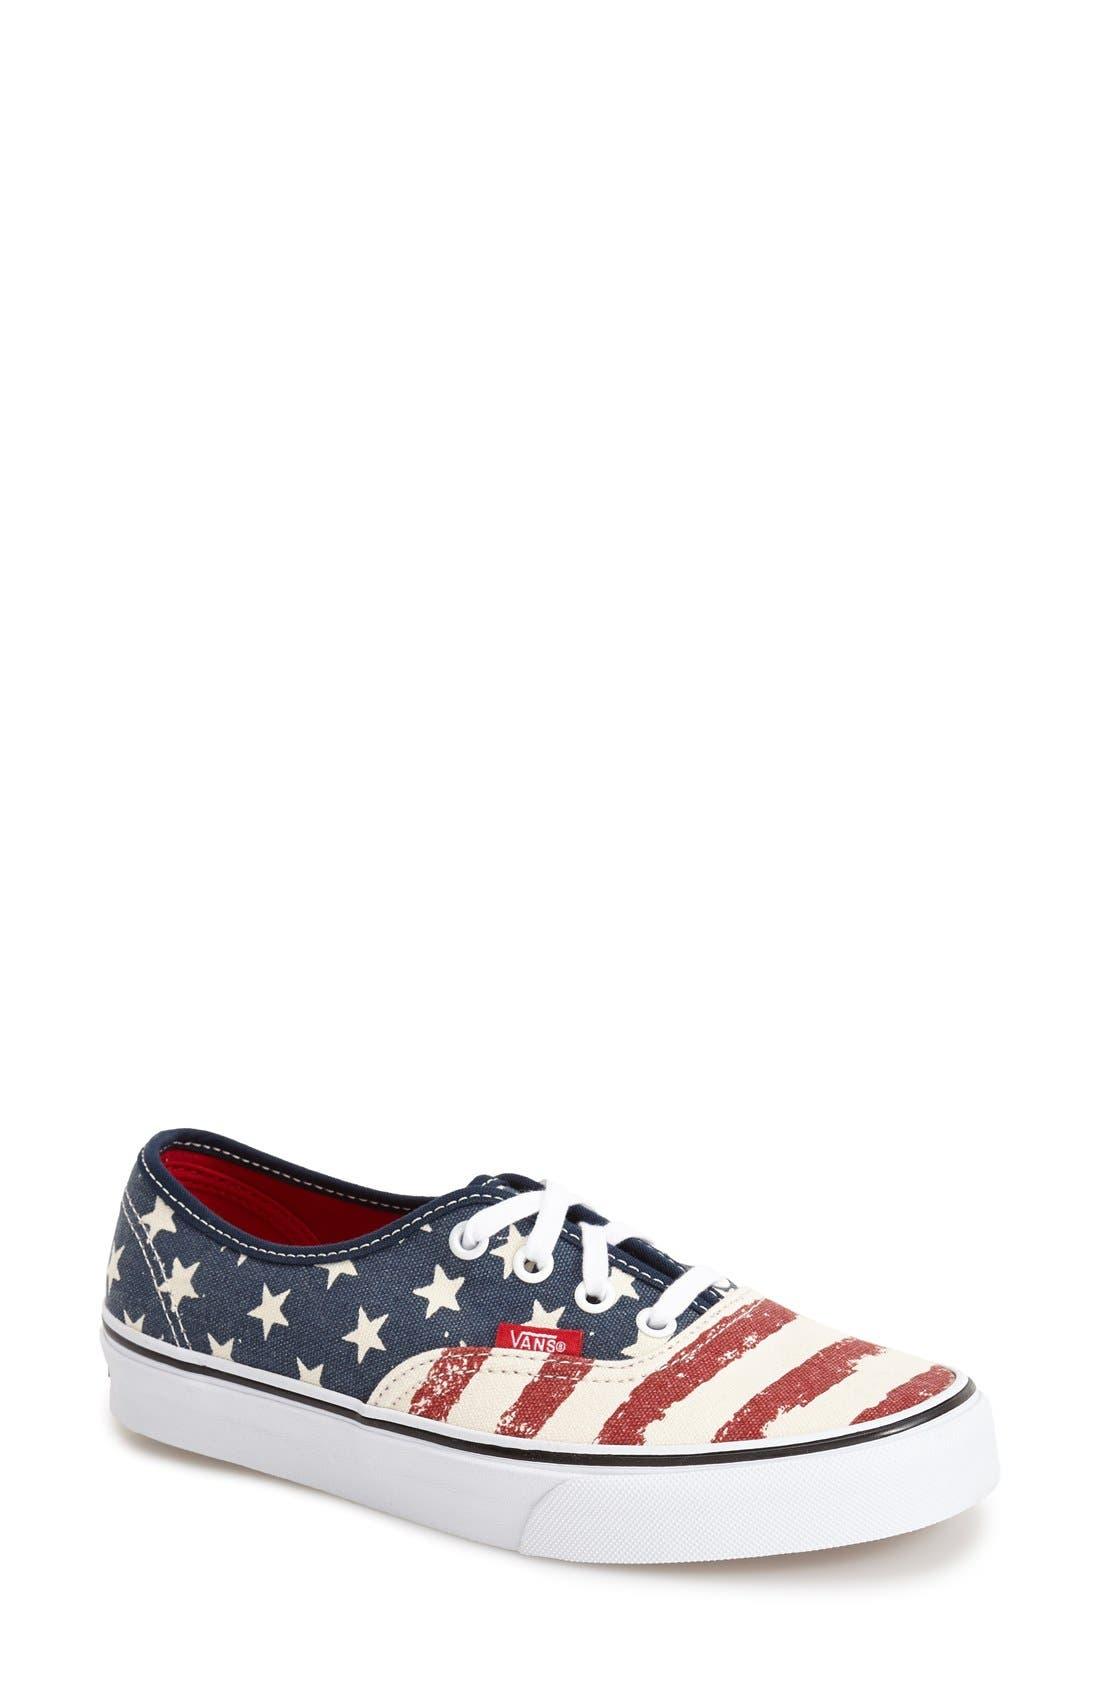 Main Image - Vans 'Authentic - Stars & Stripes' Sneaker (Women)